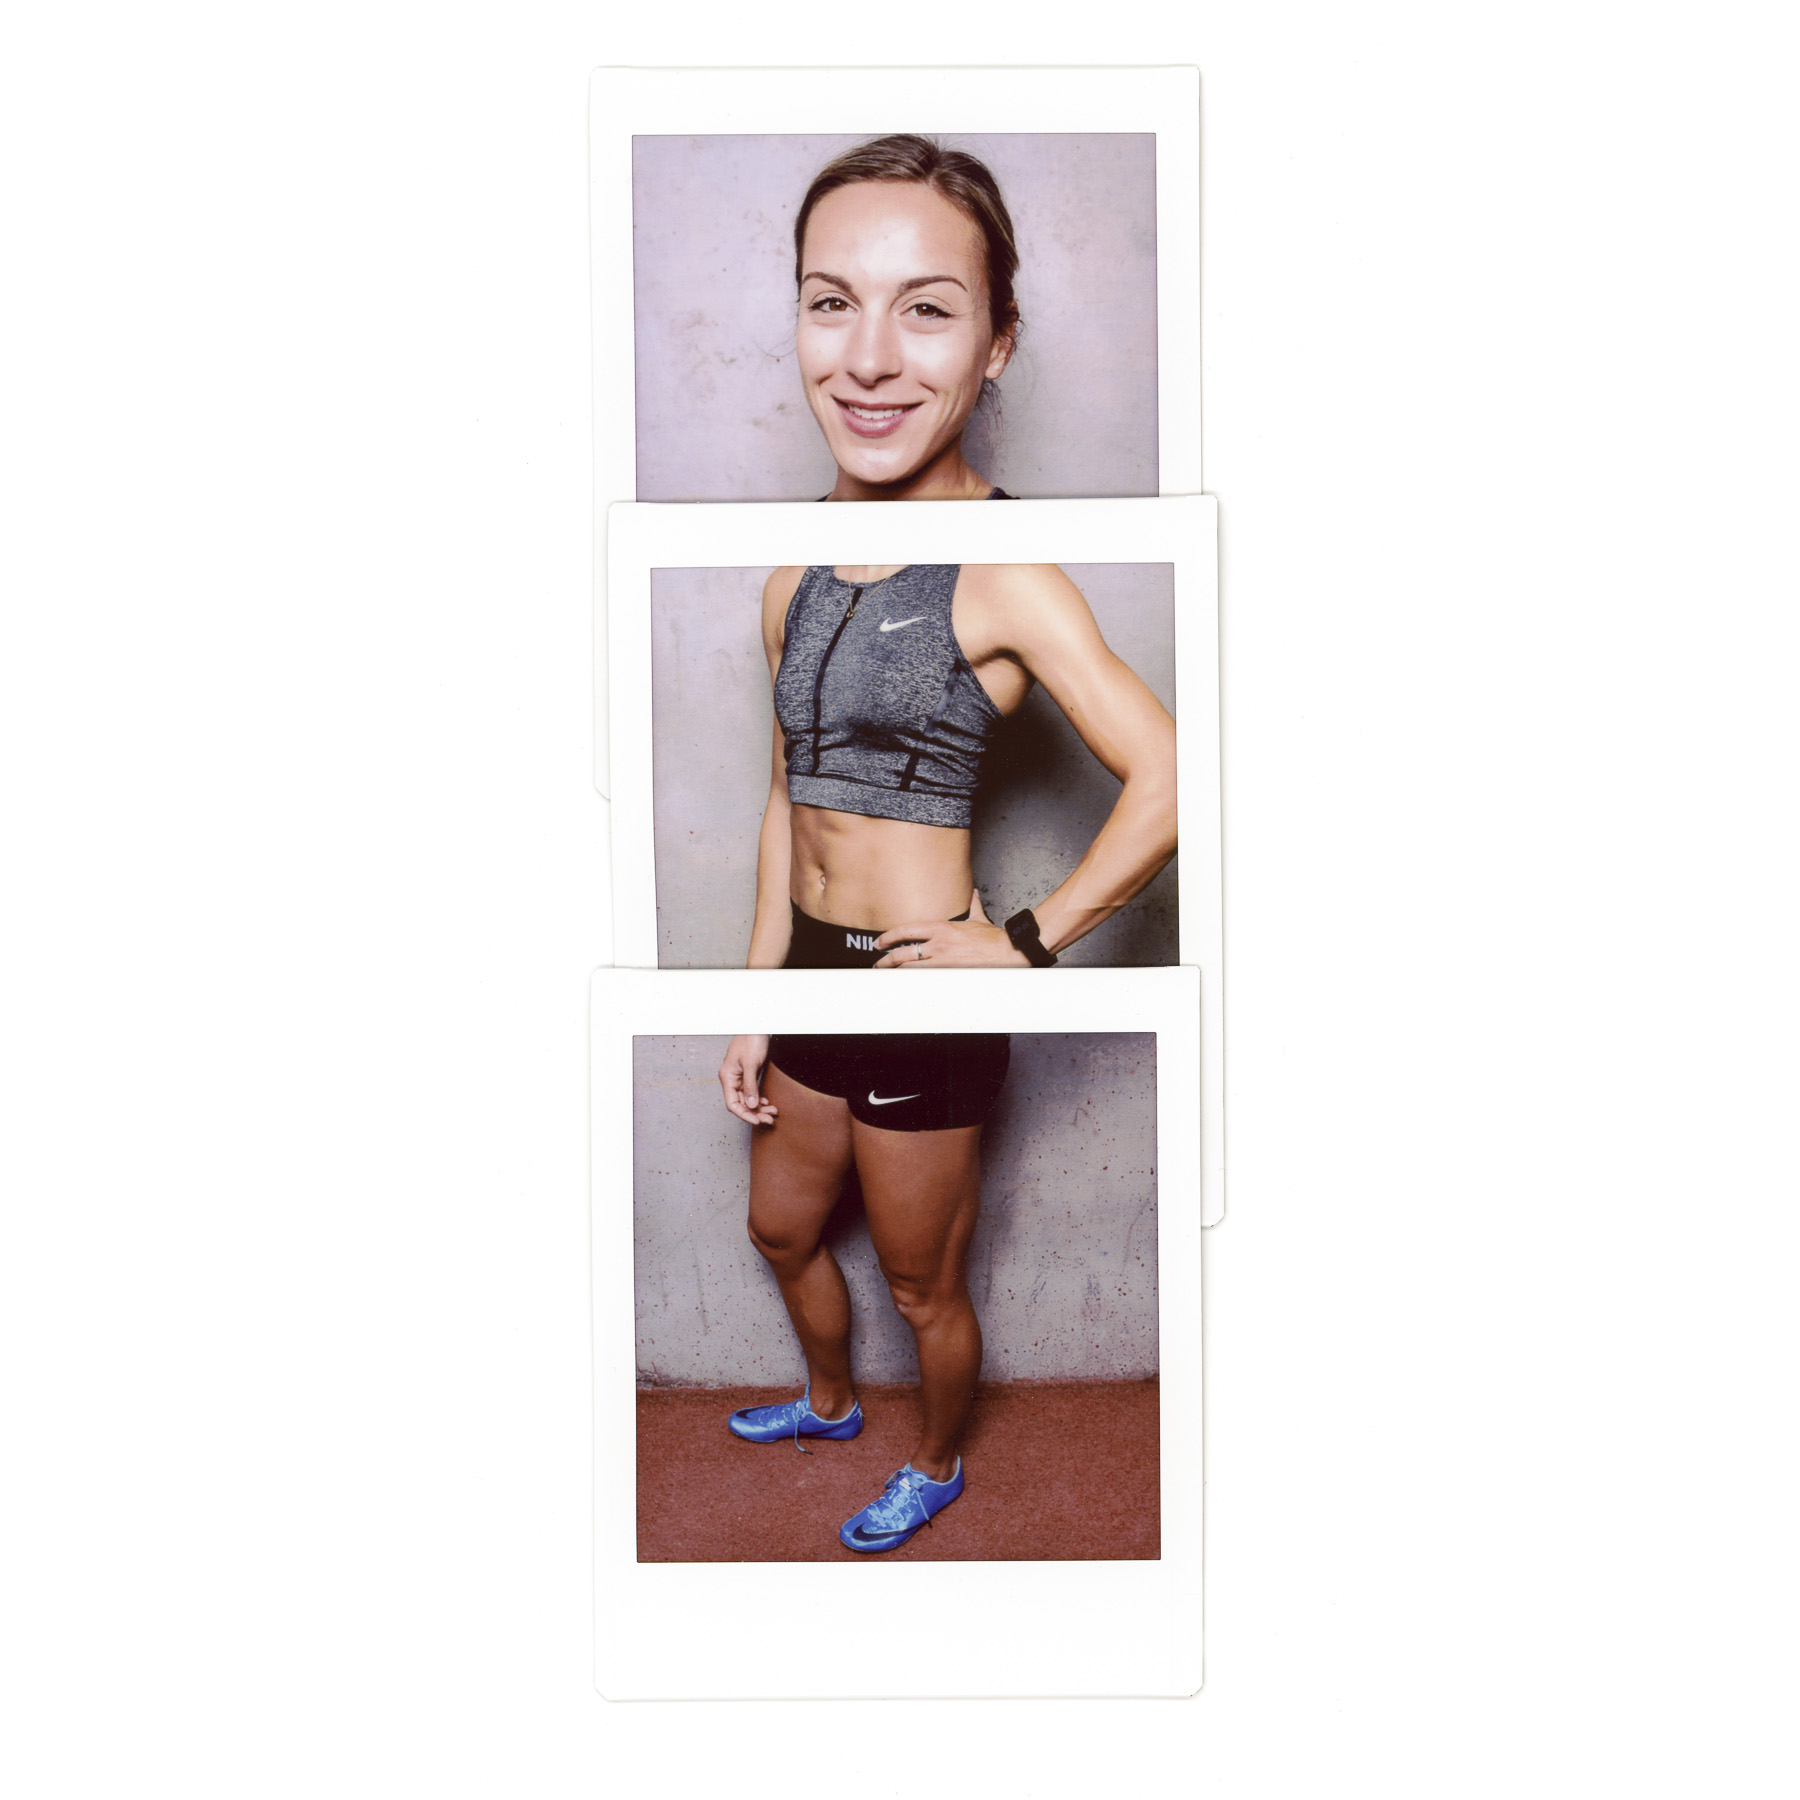 Portfolio(20180511 – Alexandra Burghardt 3er Pola – 1)